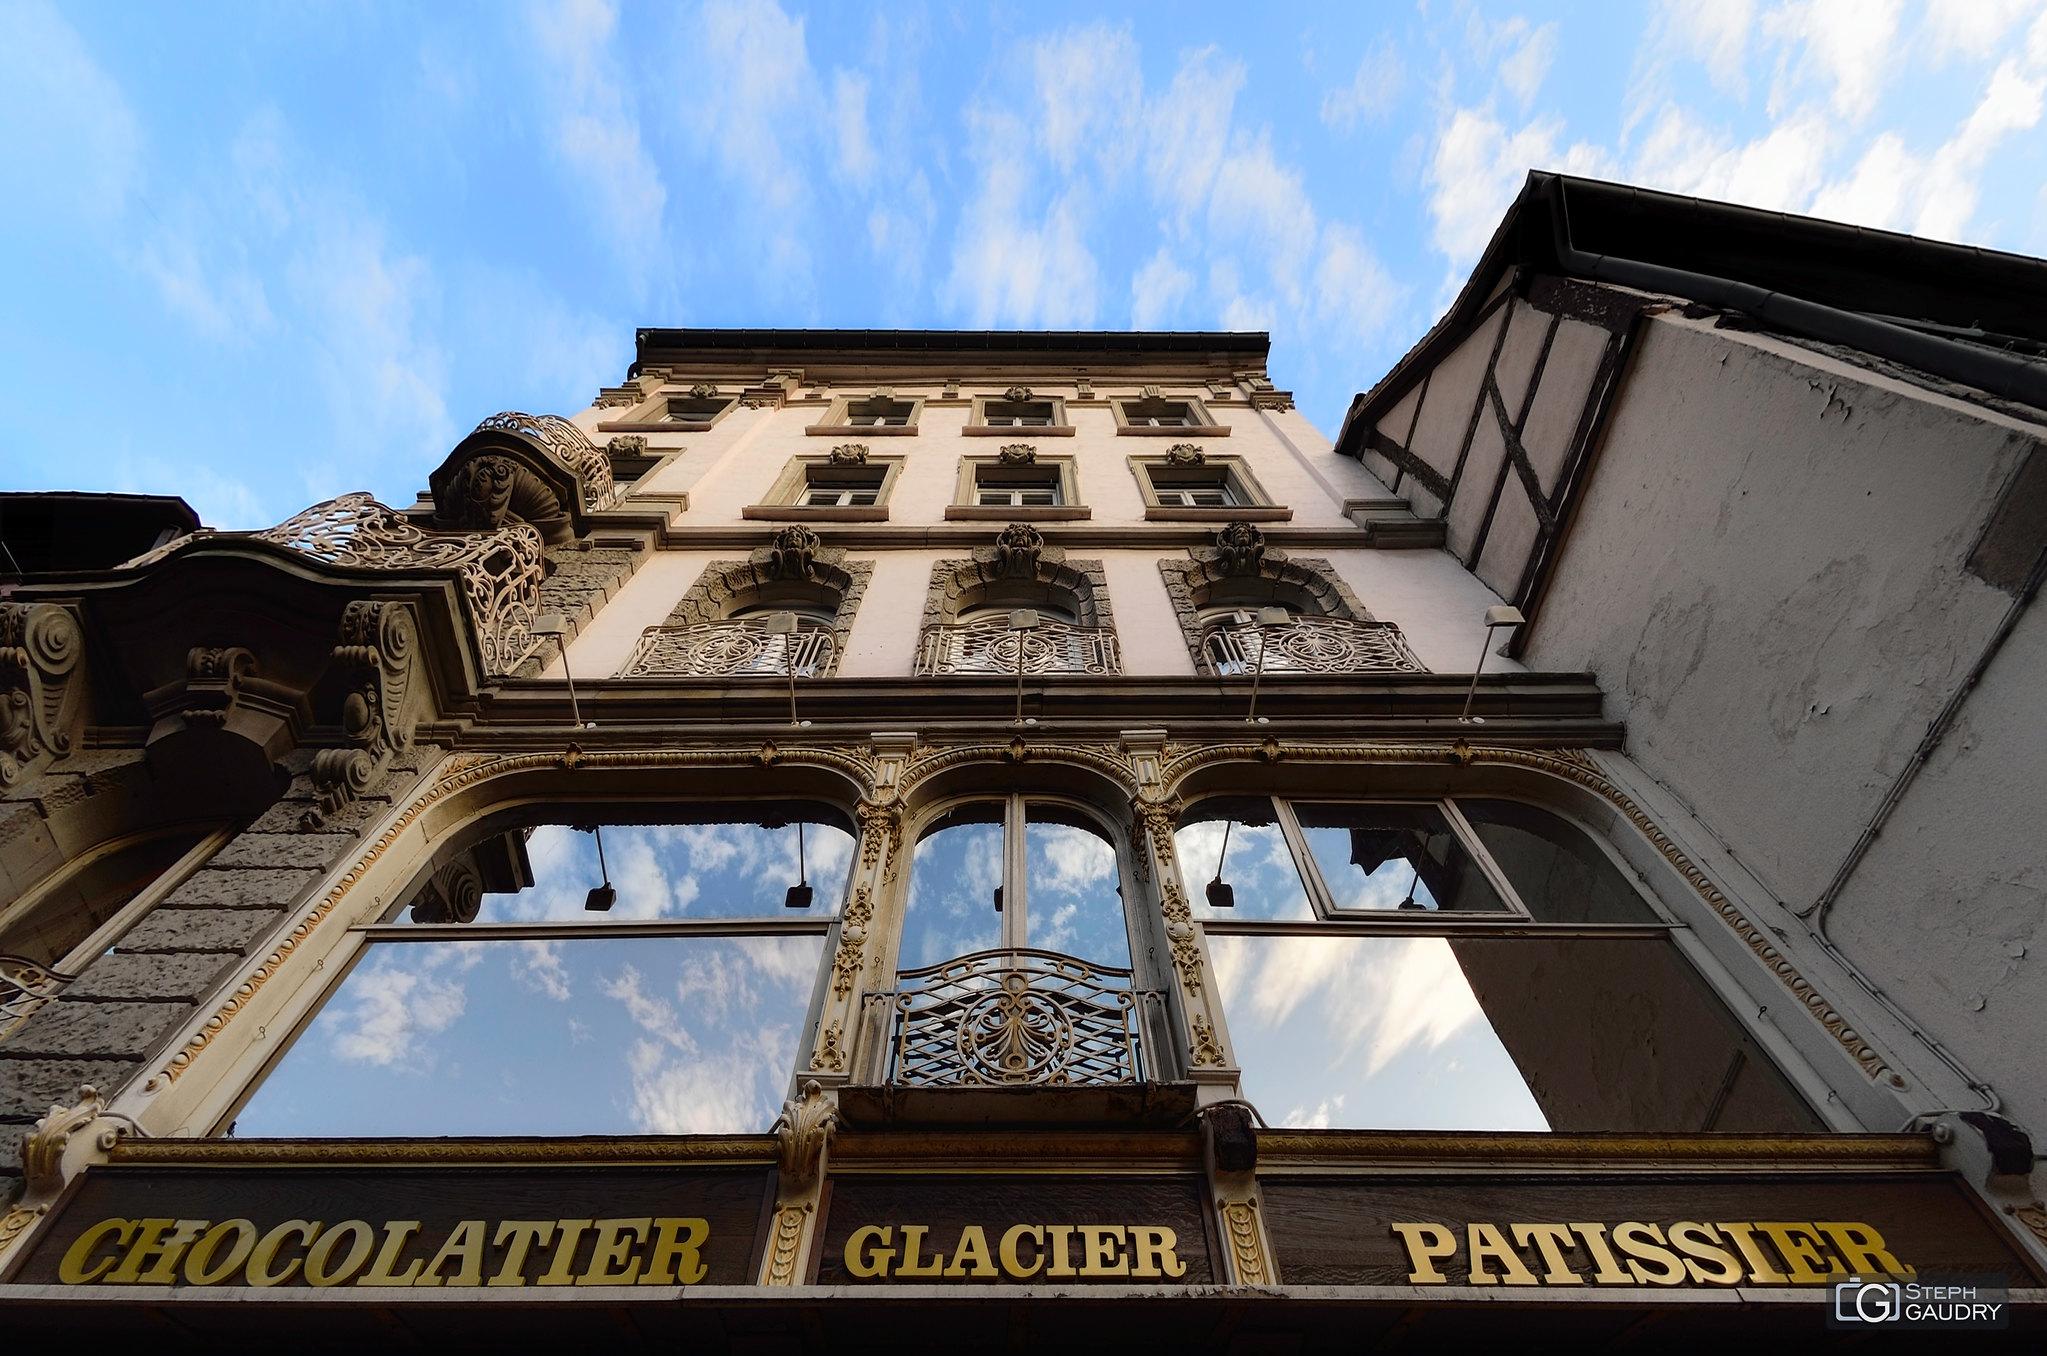 Chocolatier-Glacier-Pâtissier [Click to start slideshow]